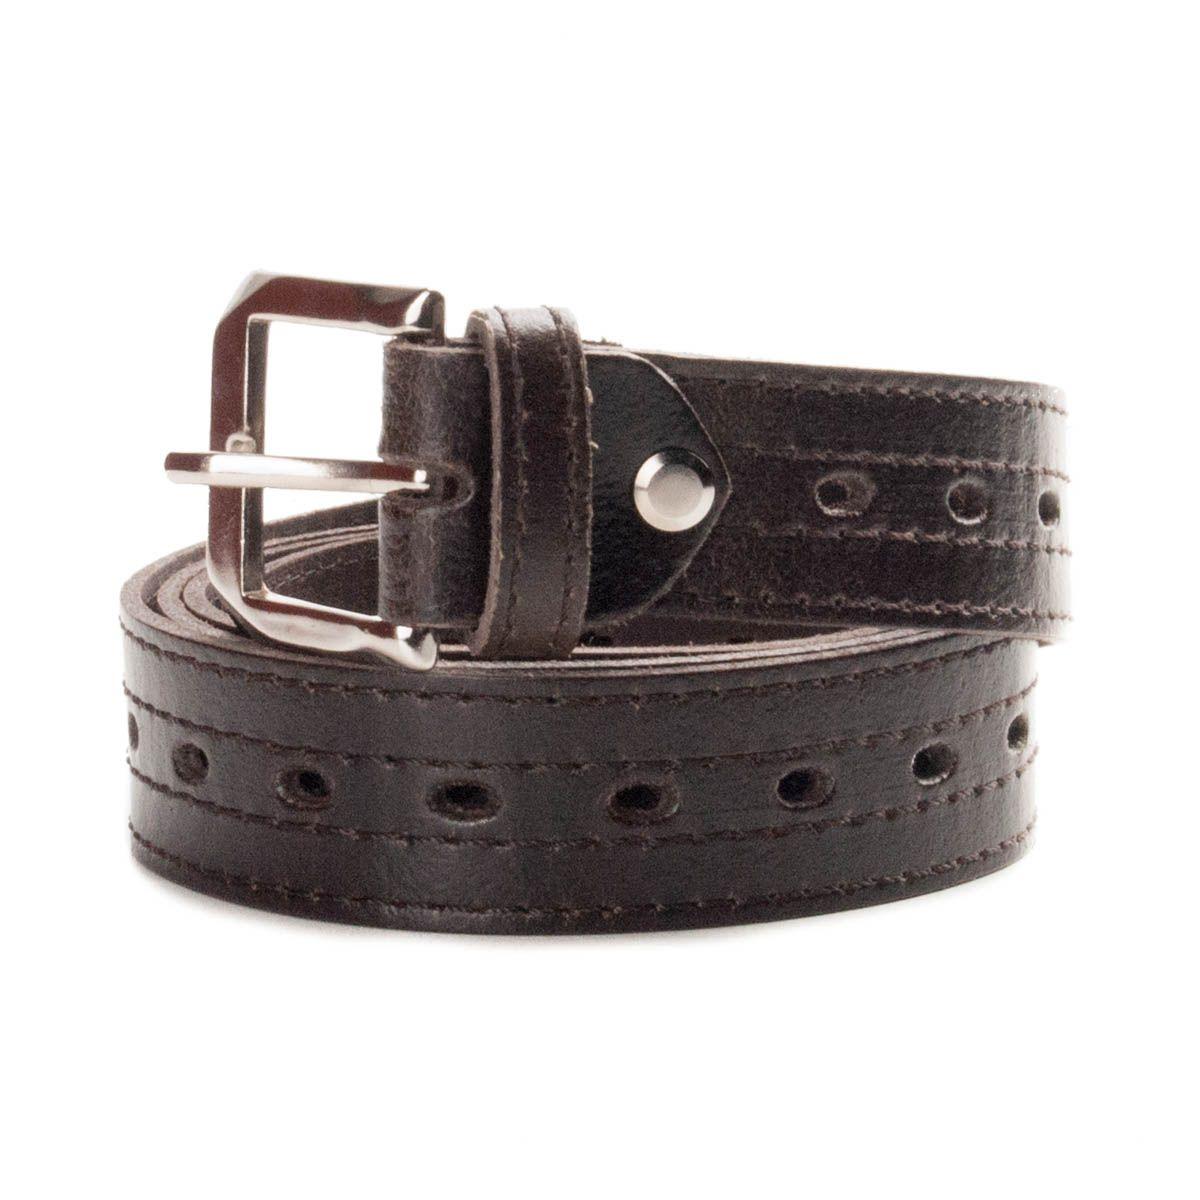 Montevita Casual Quality Belt in Brown